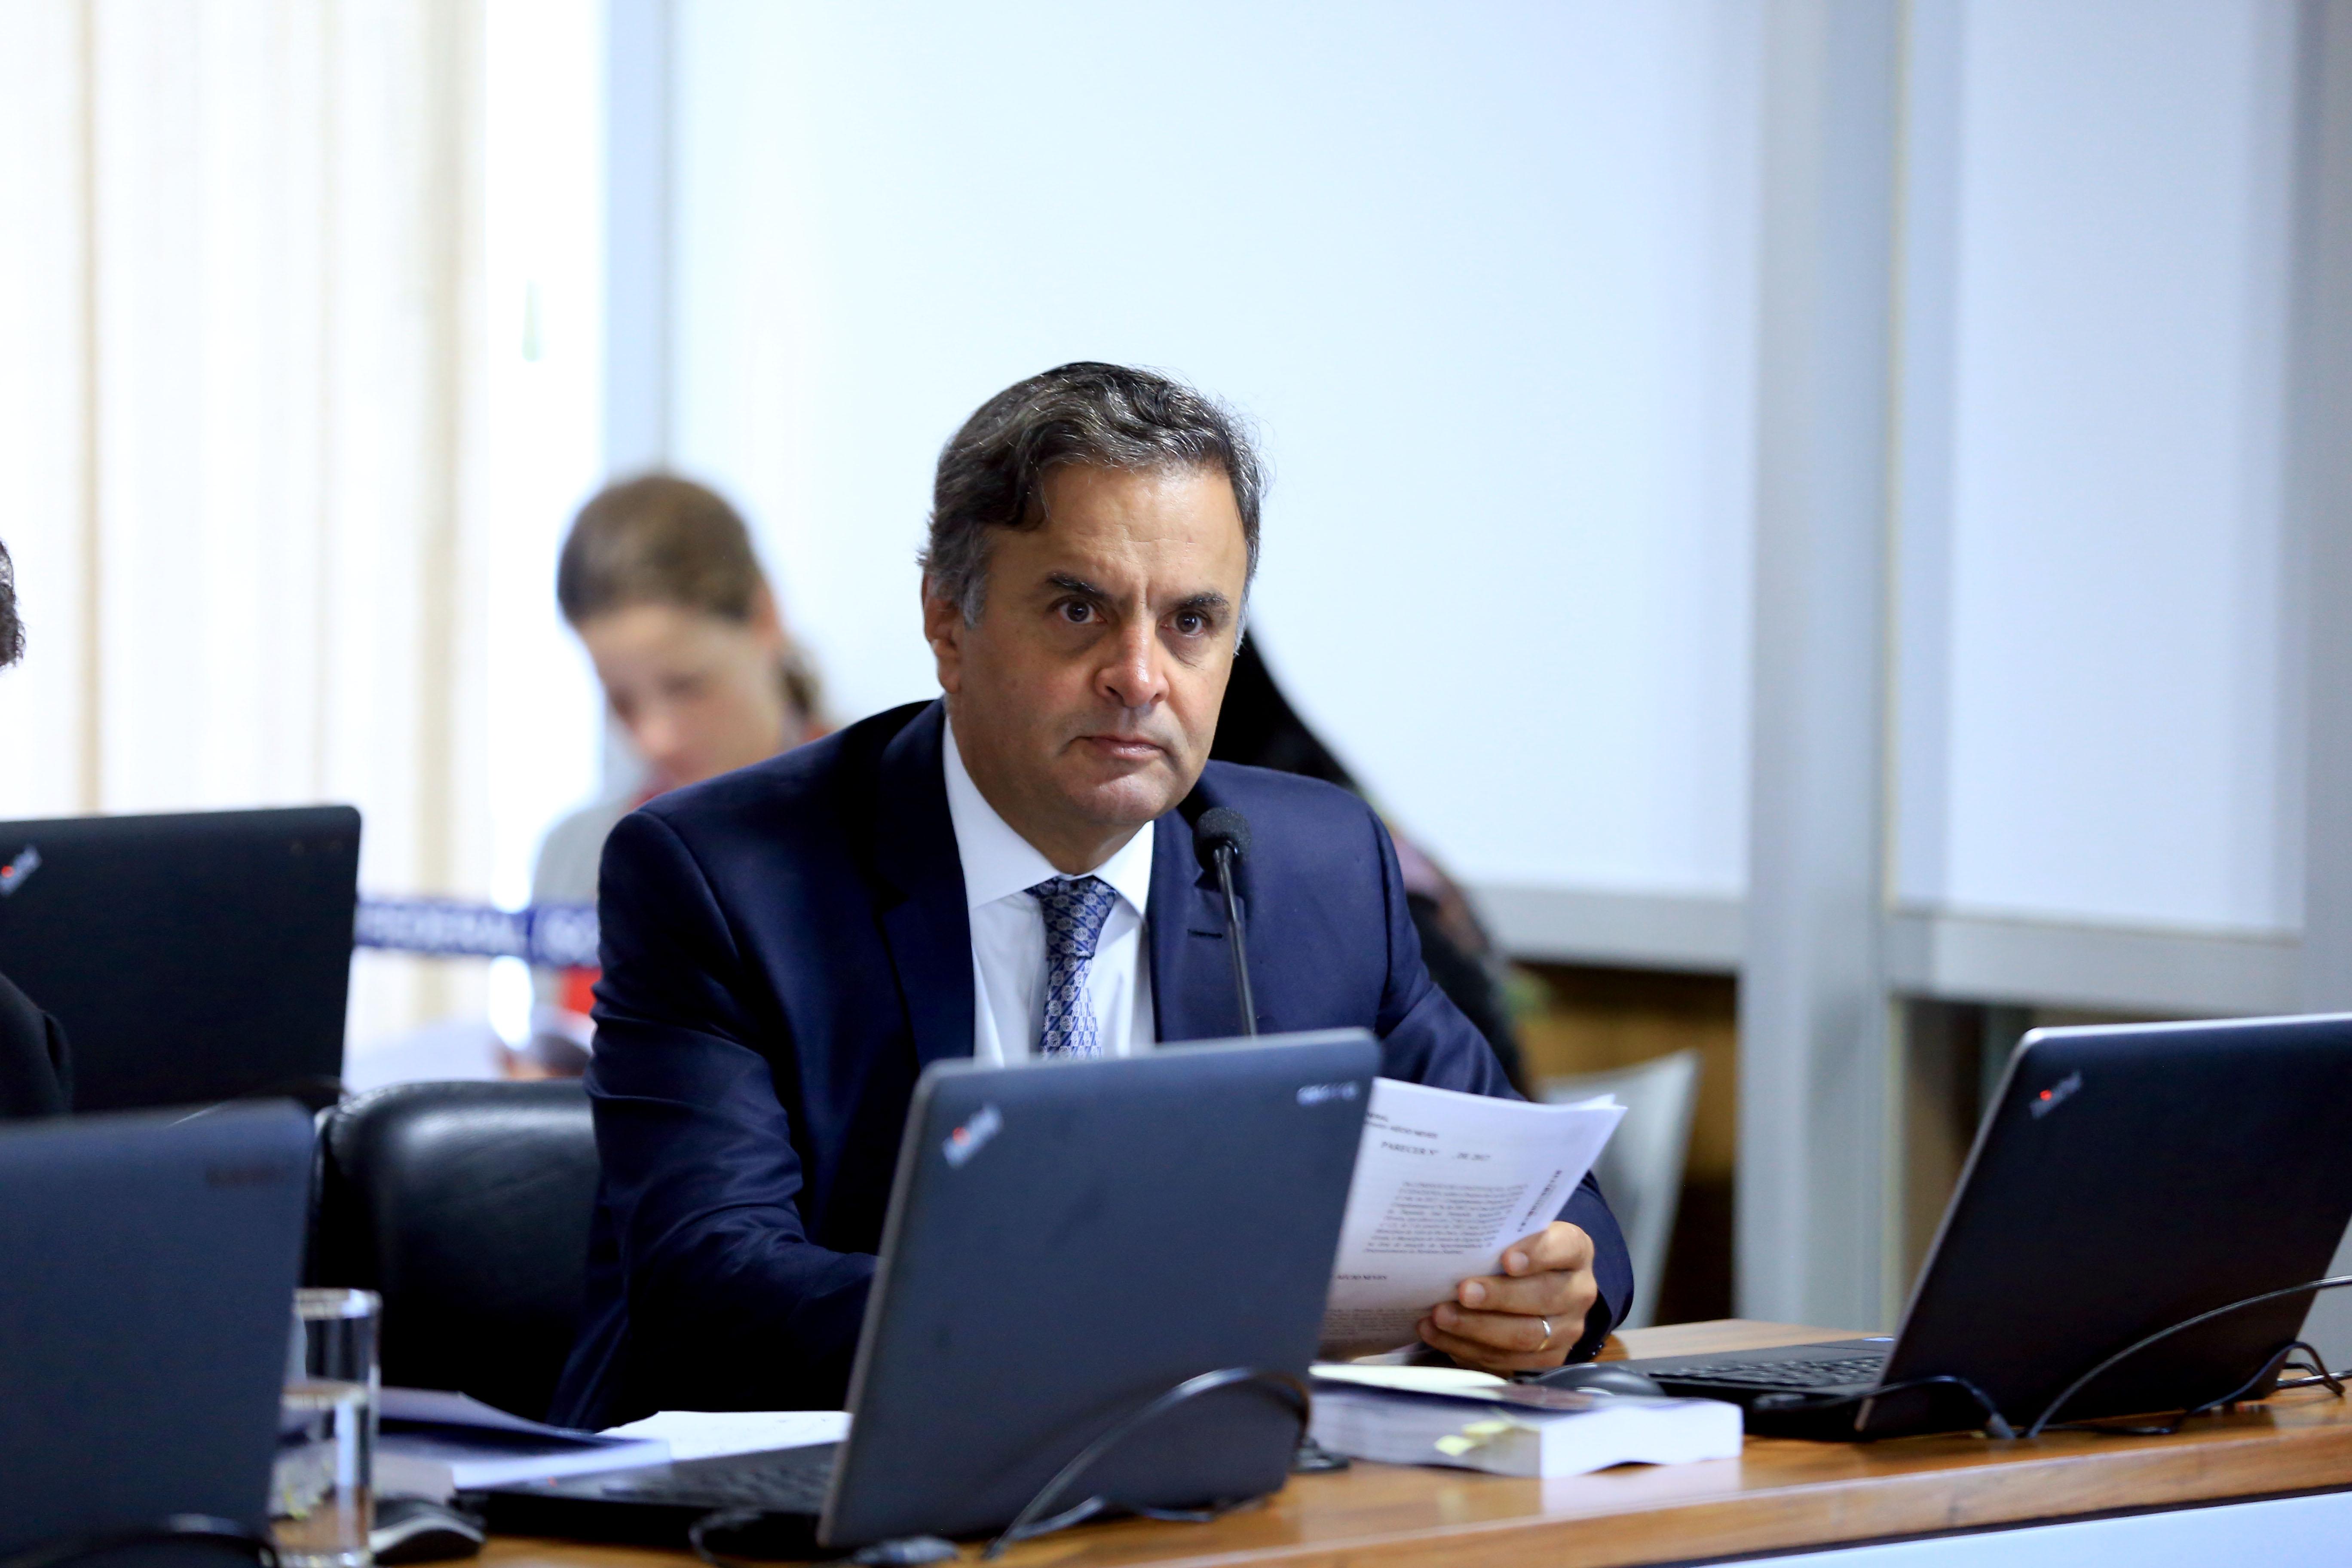 21-02-18 Senador Aécio Neves participa da  CCJ - Foto Gerdan Wesley (11)